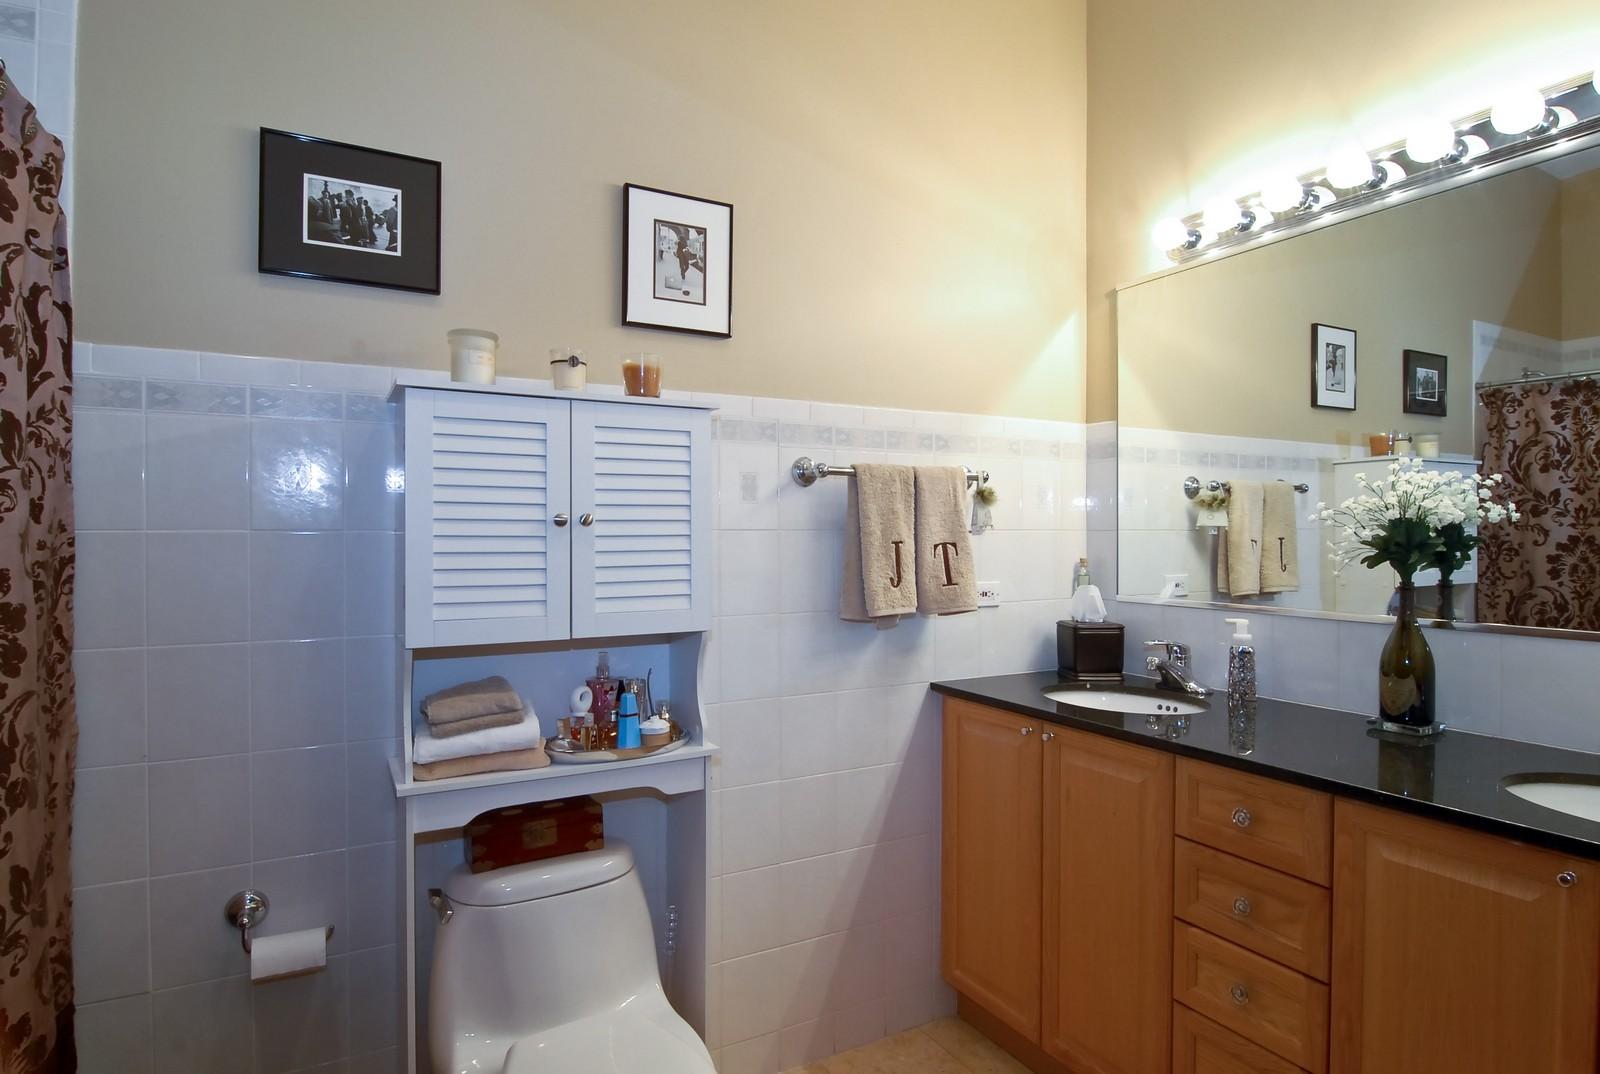 Real Estate Photography - 1901 W Armitage, Unit 1E, Chicago, IL, 60622 - Master Bathroom